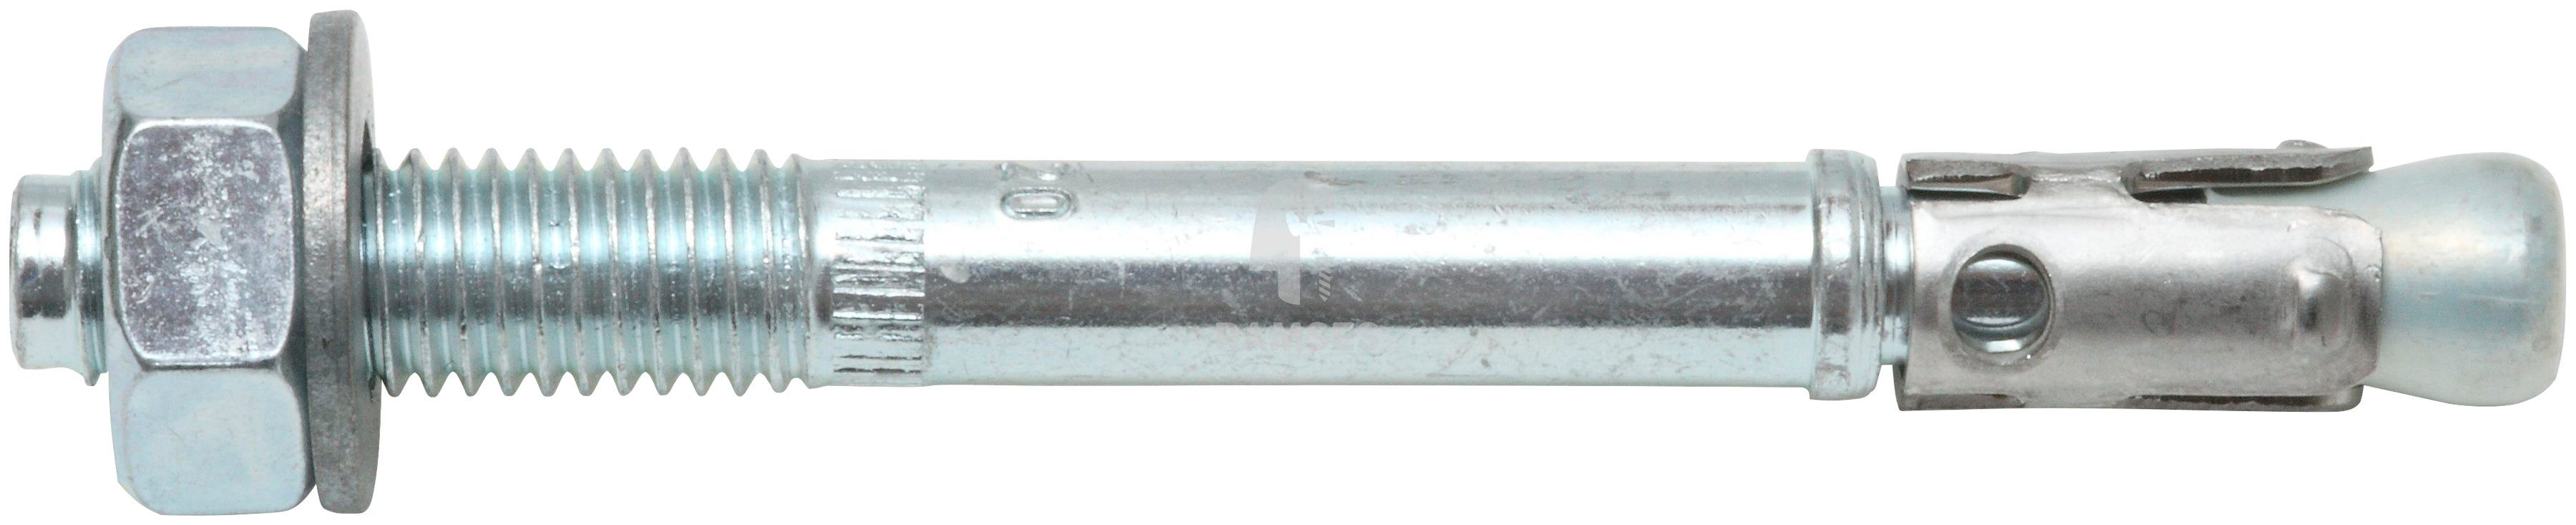 RAMSES Dübel , Bolzenanker BZ plus M12 x 125 mm, 10 Stück